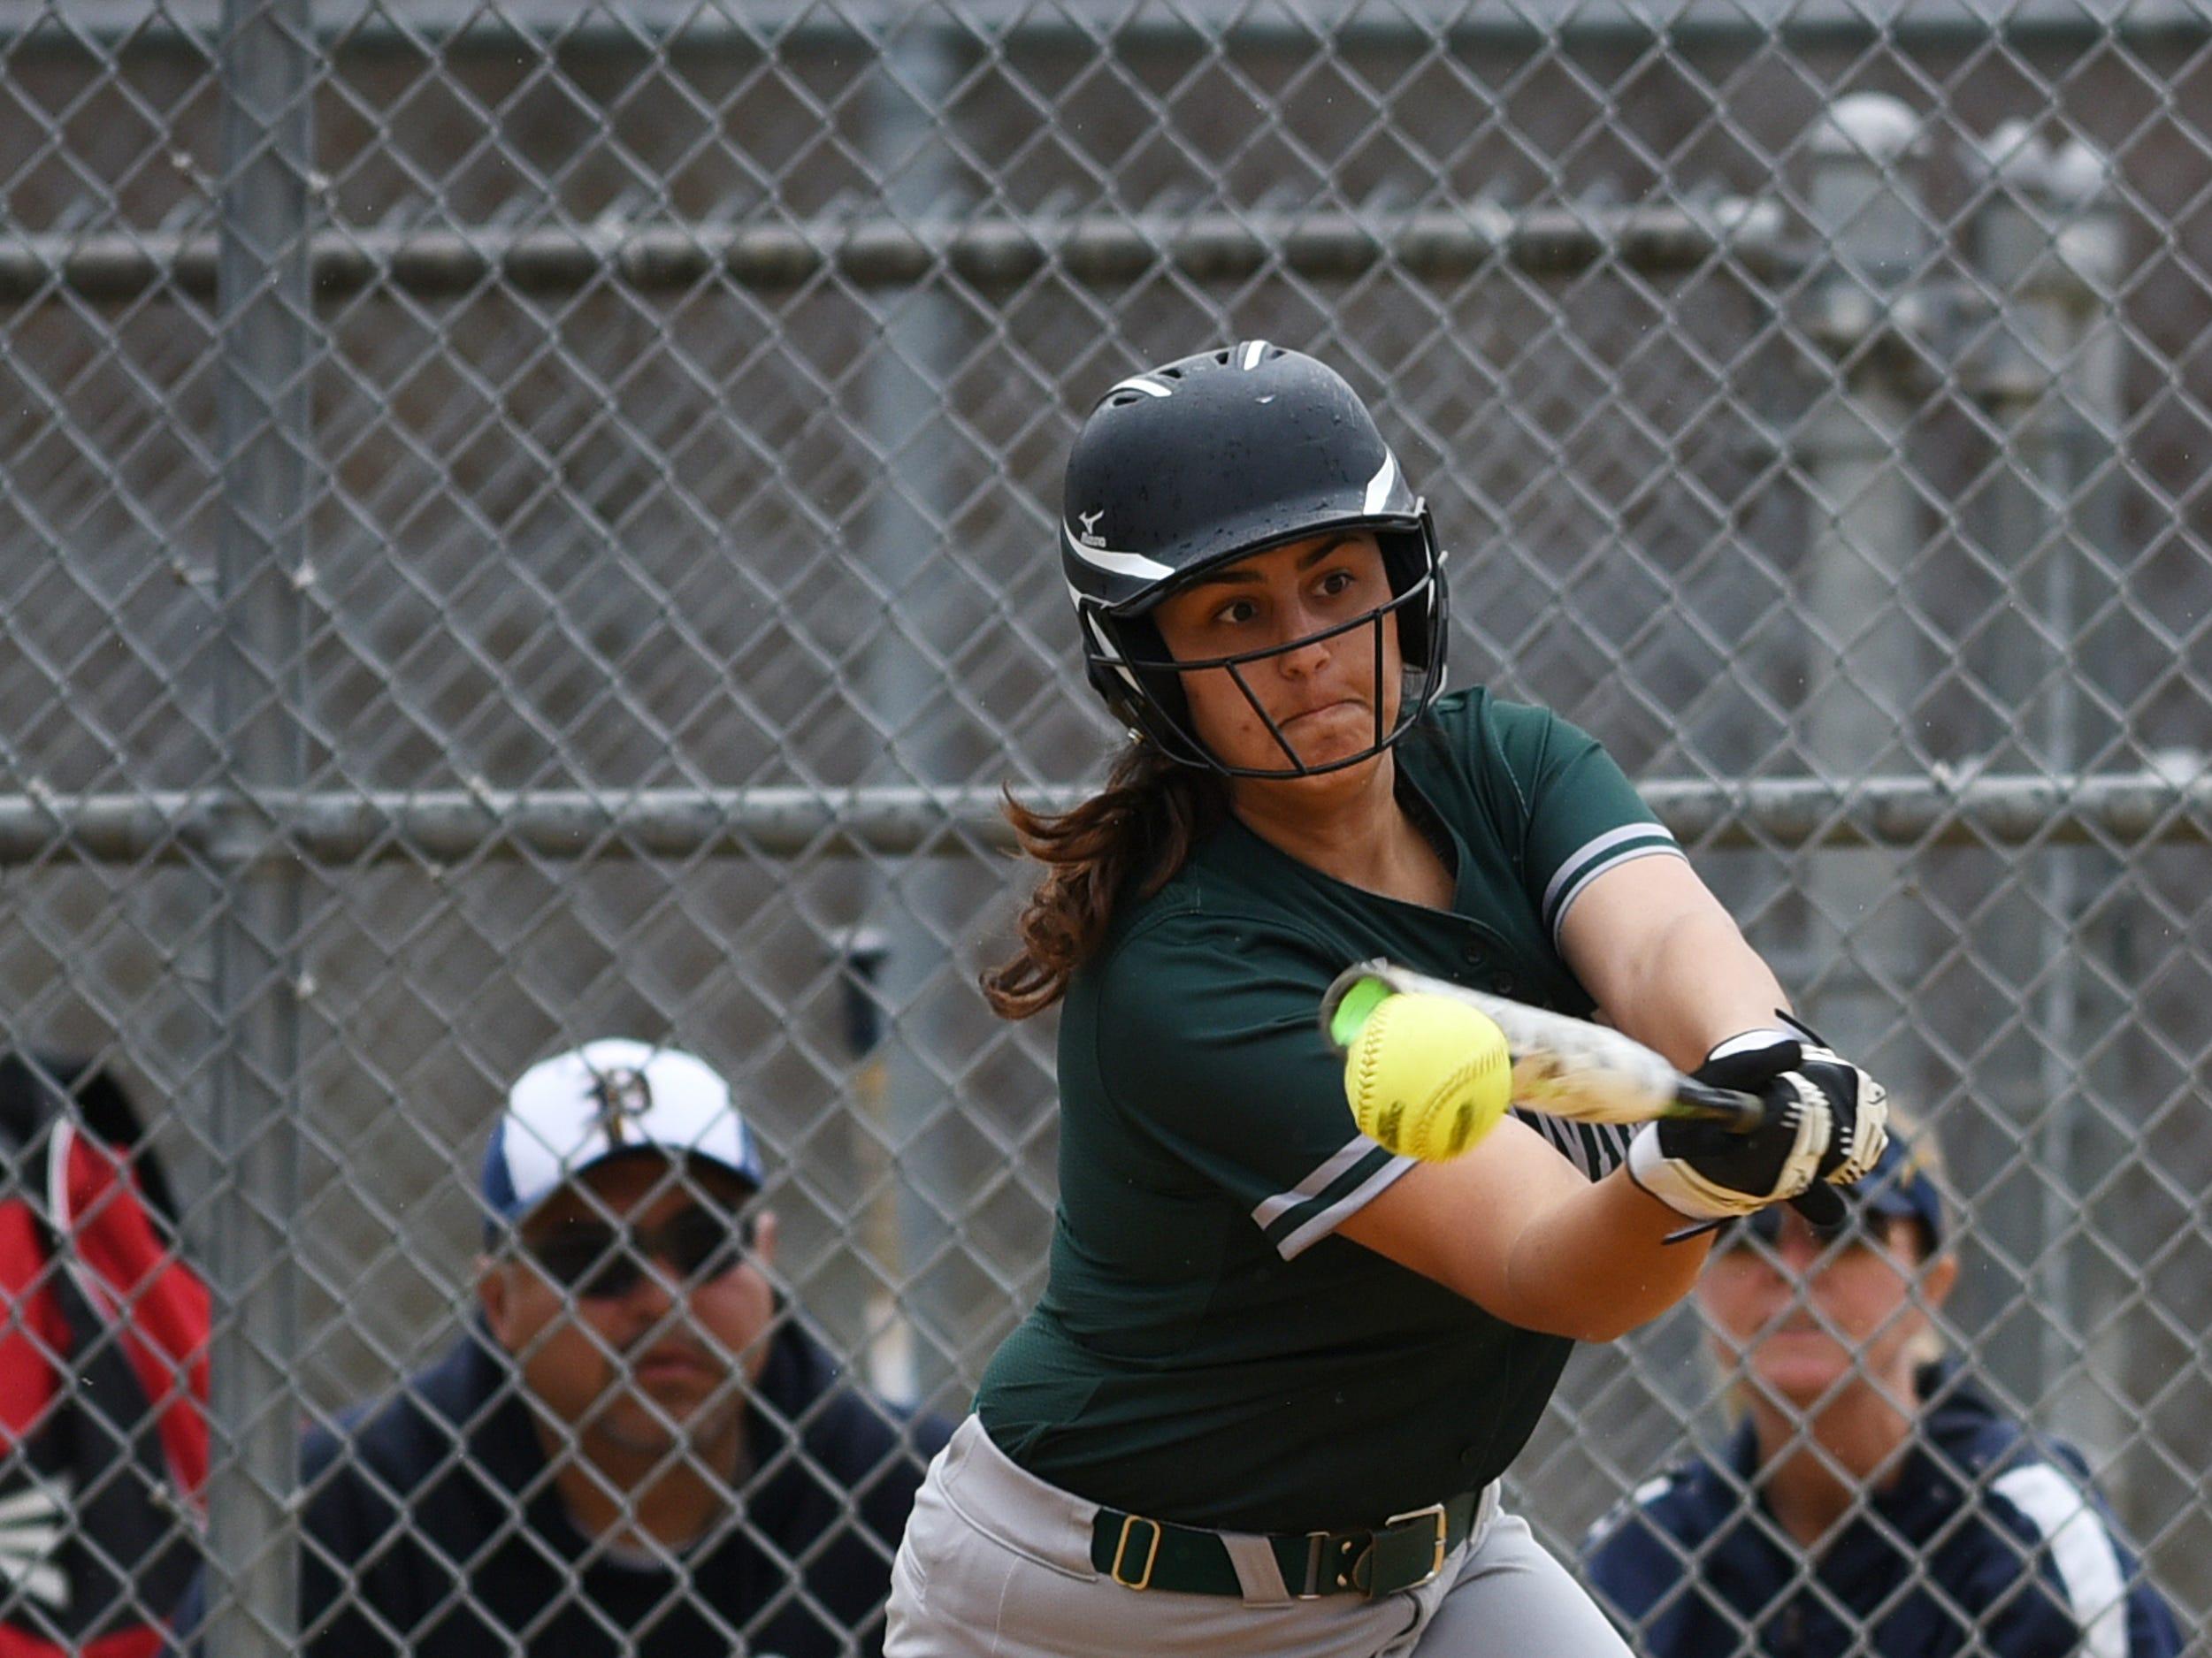 Pequannock at Kinnelon softball game in Kinnelon on Friday April 12, 2019. K#9 Renee Ritacco hits the ball.